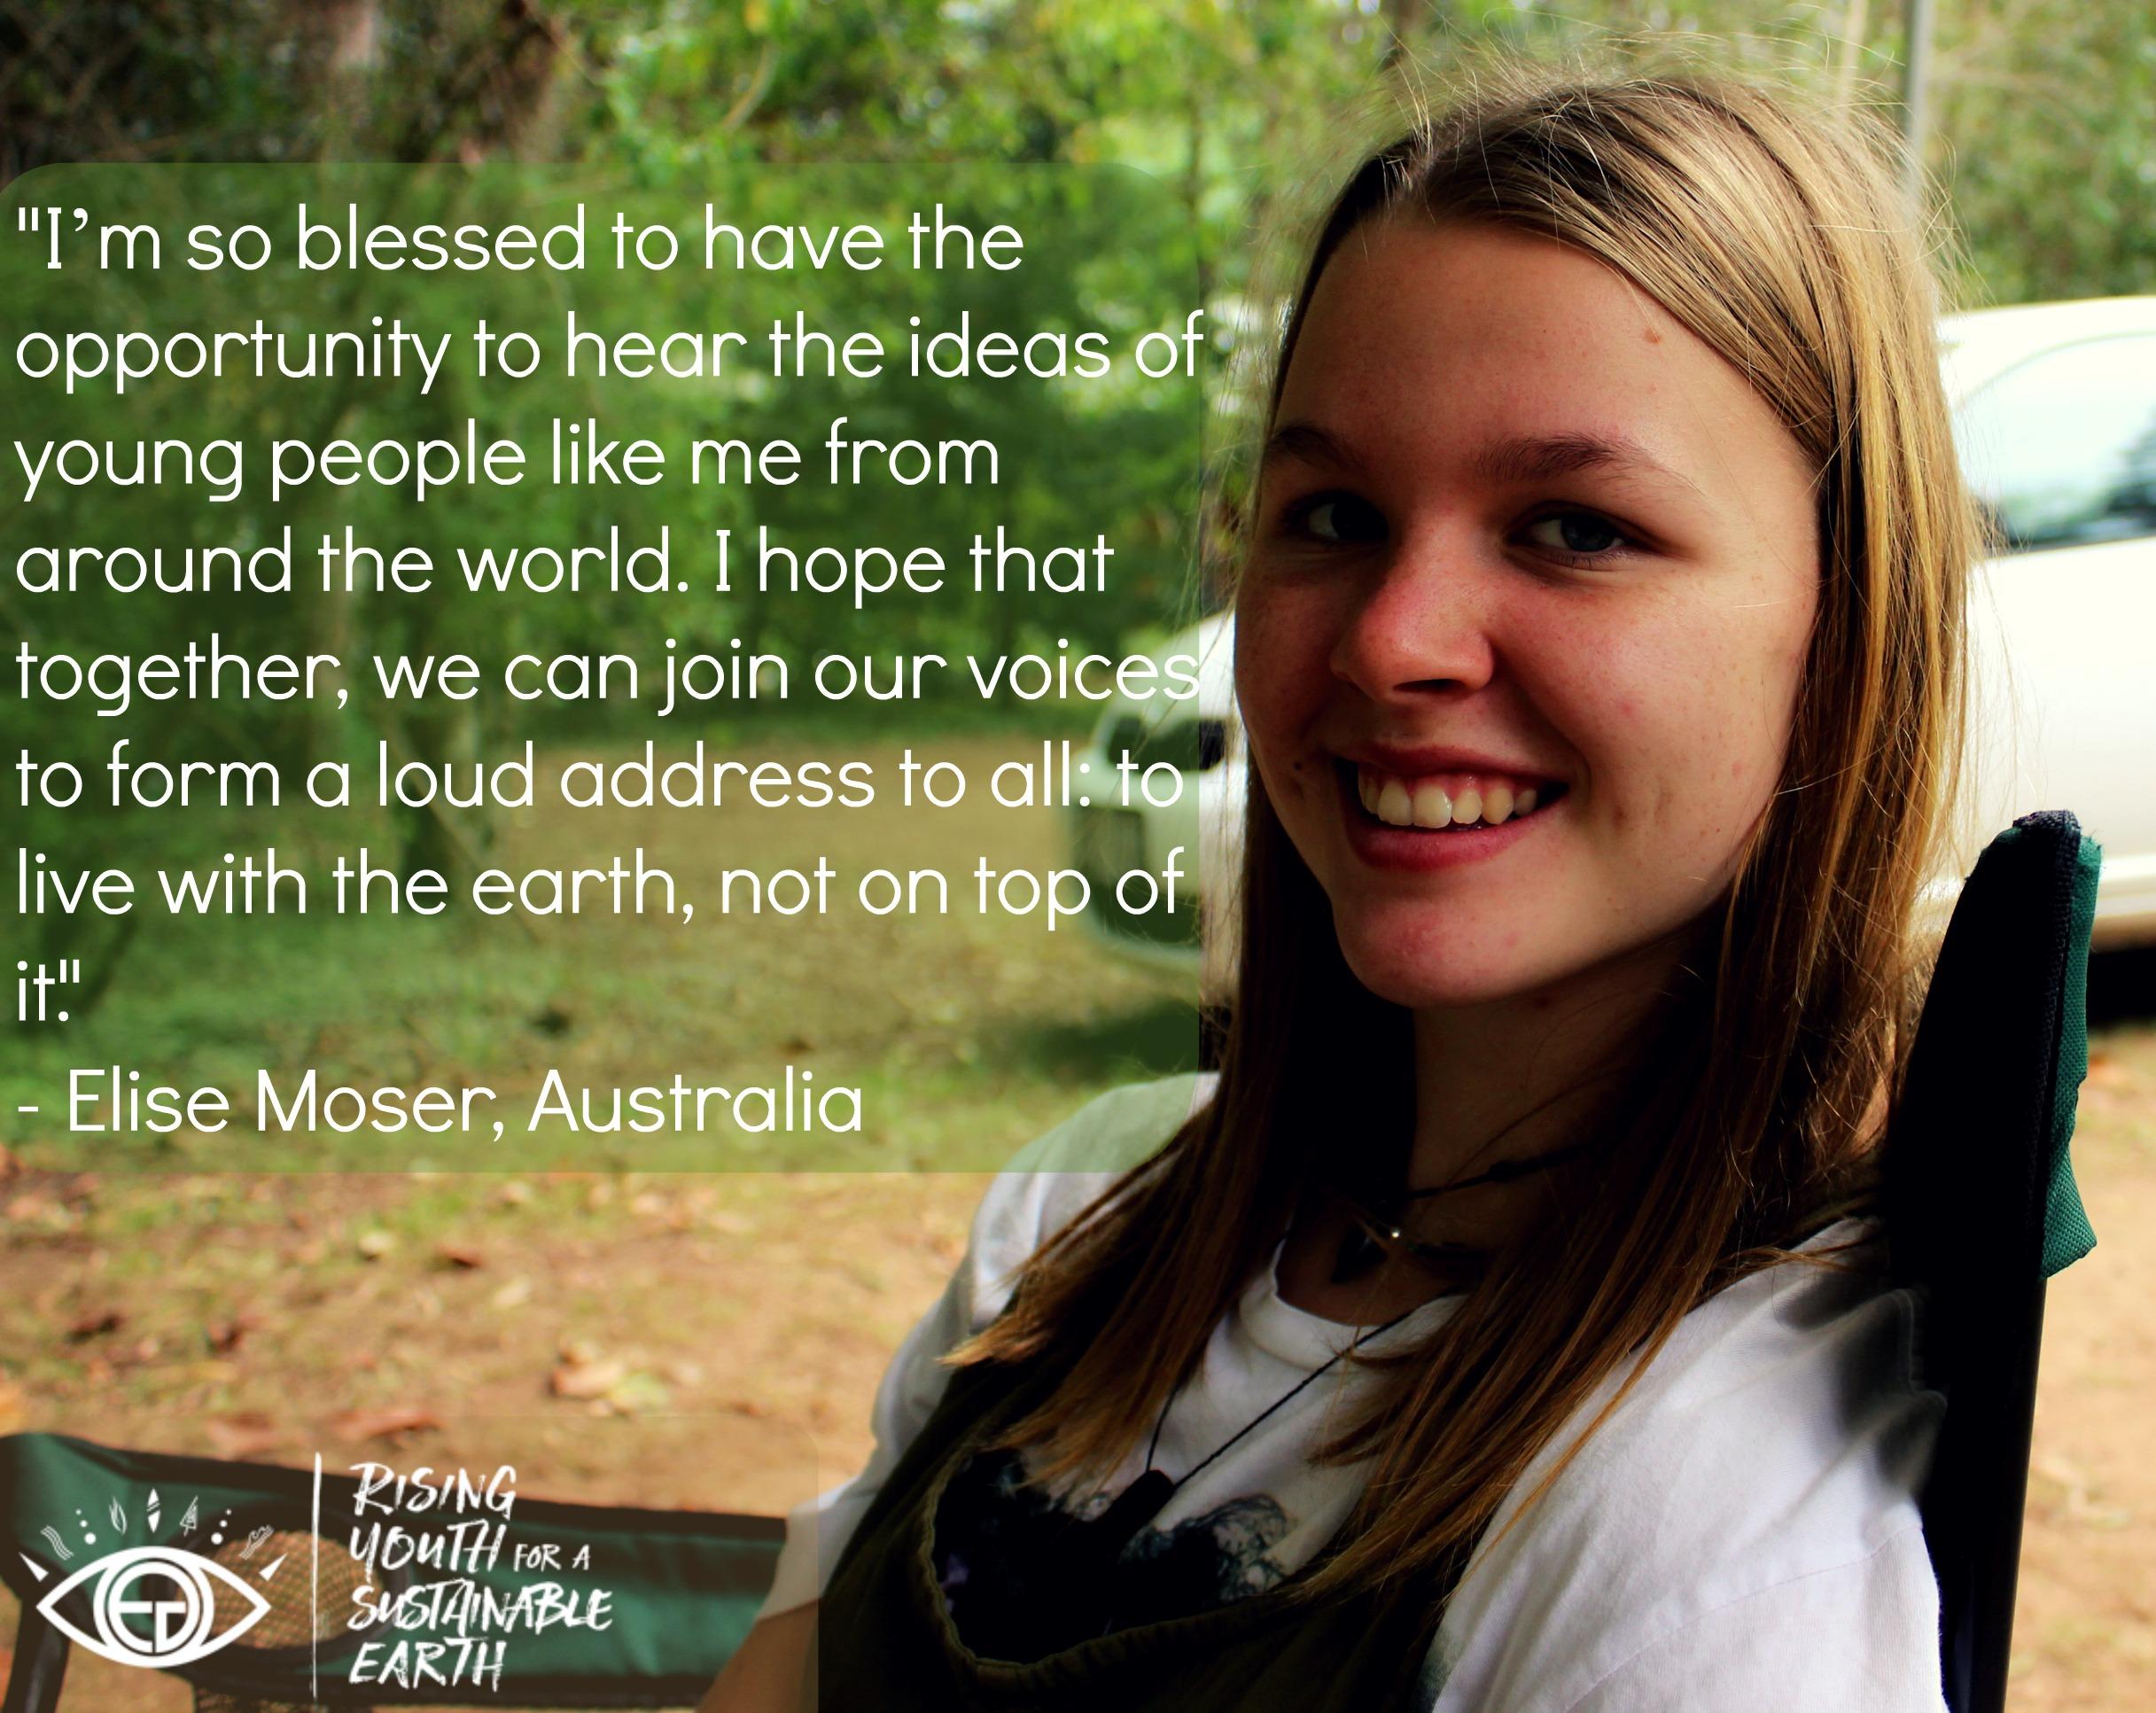 Elise Moser, age 18